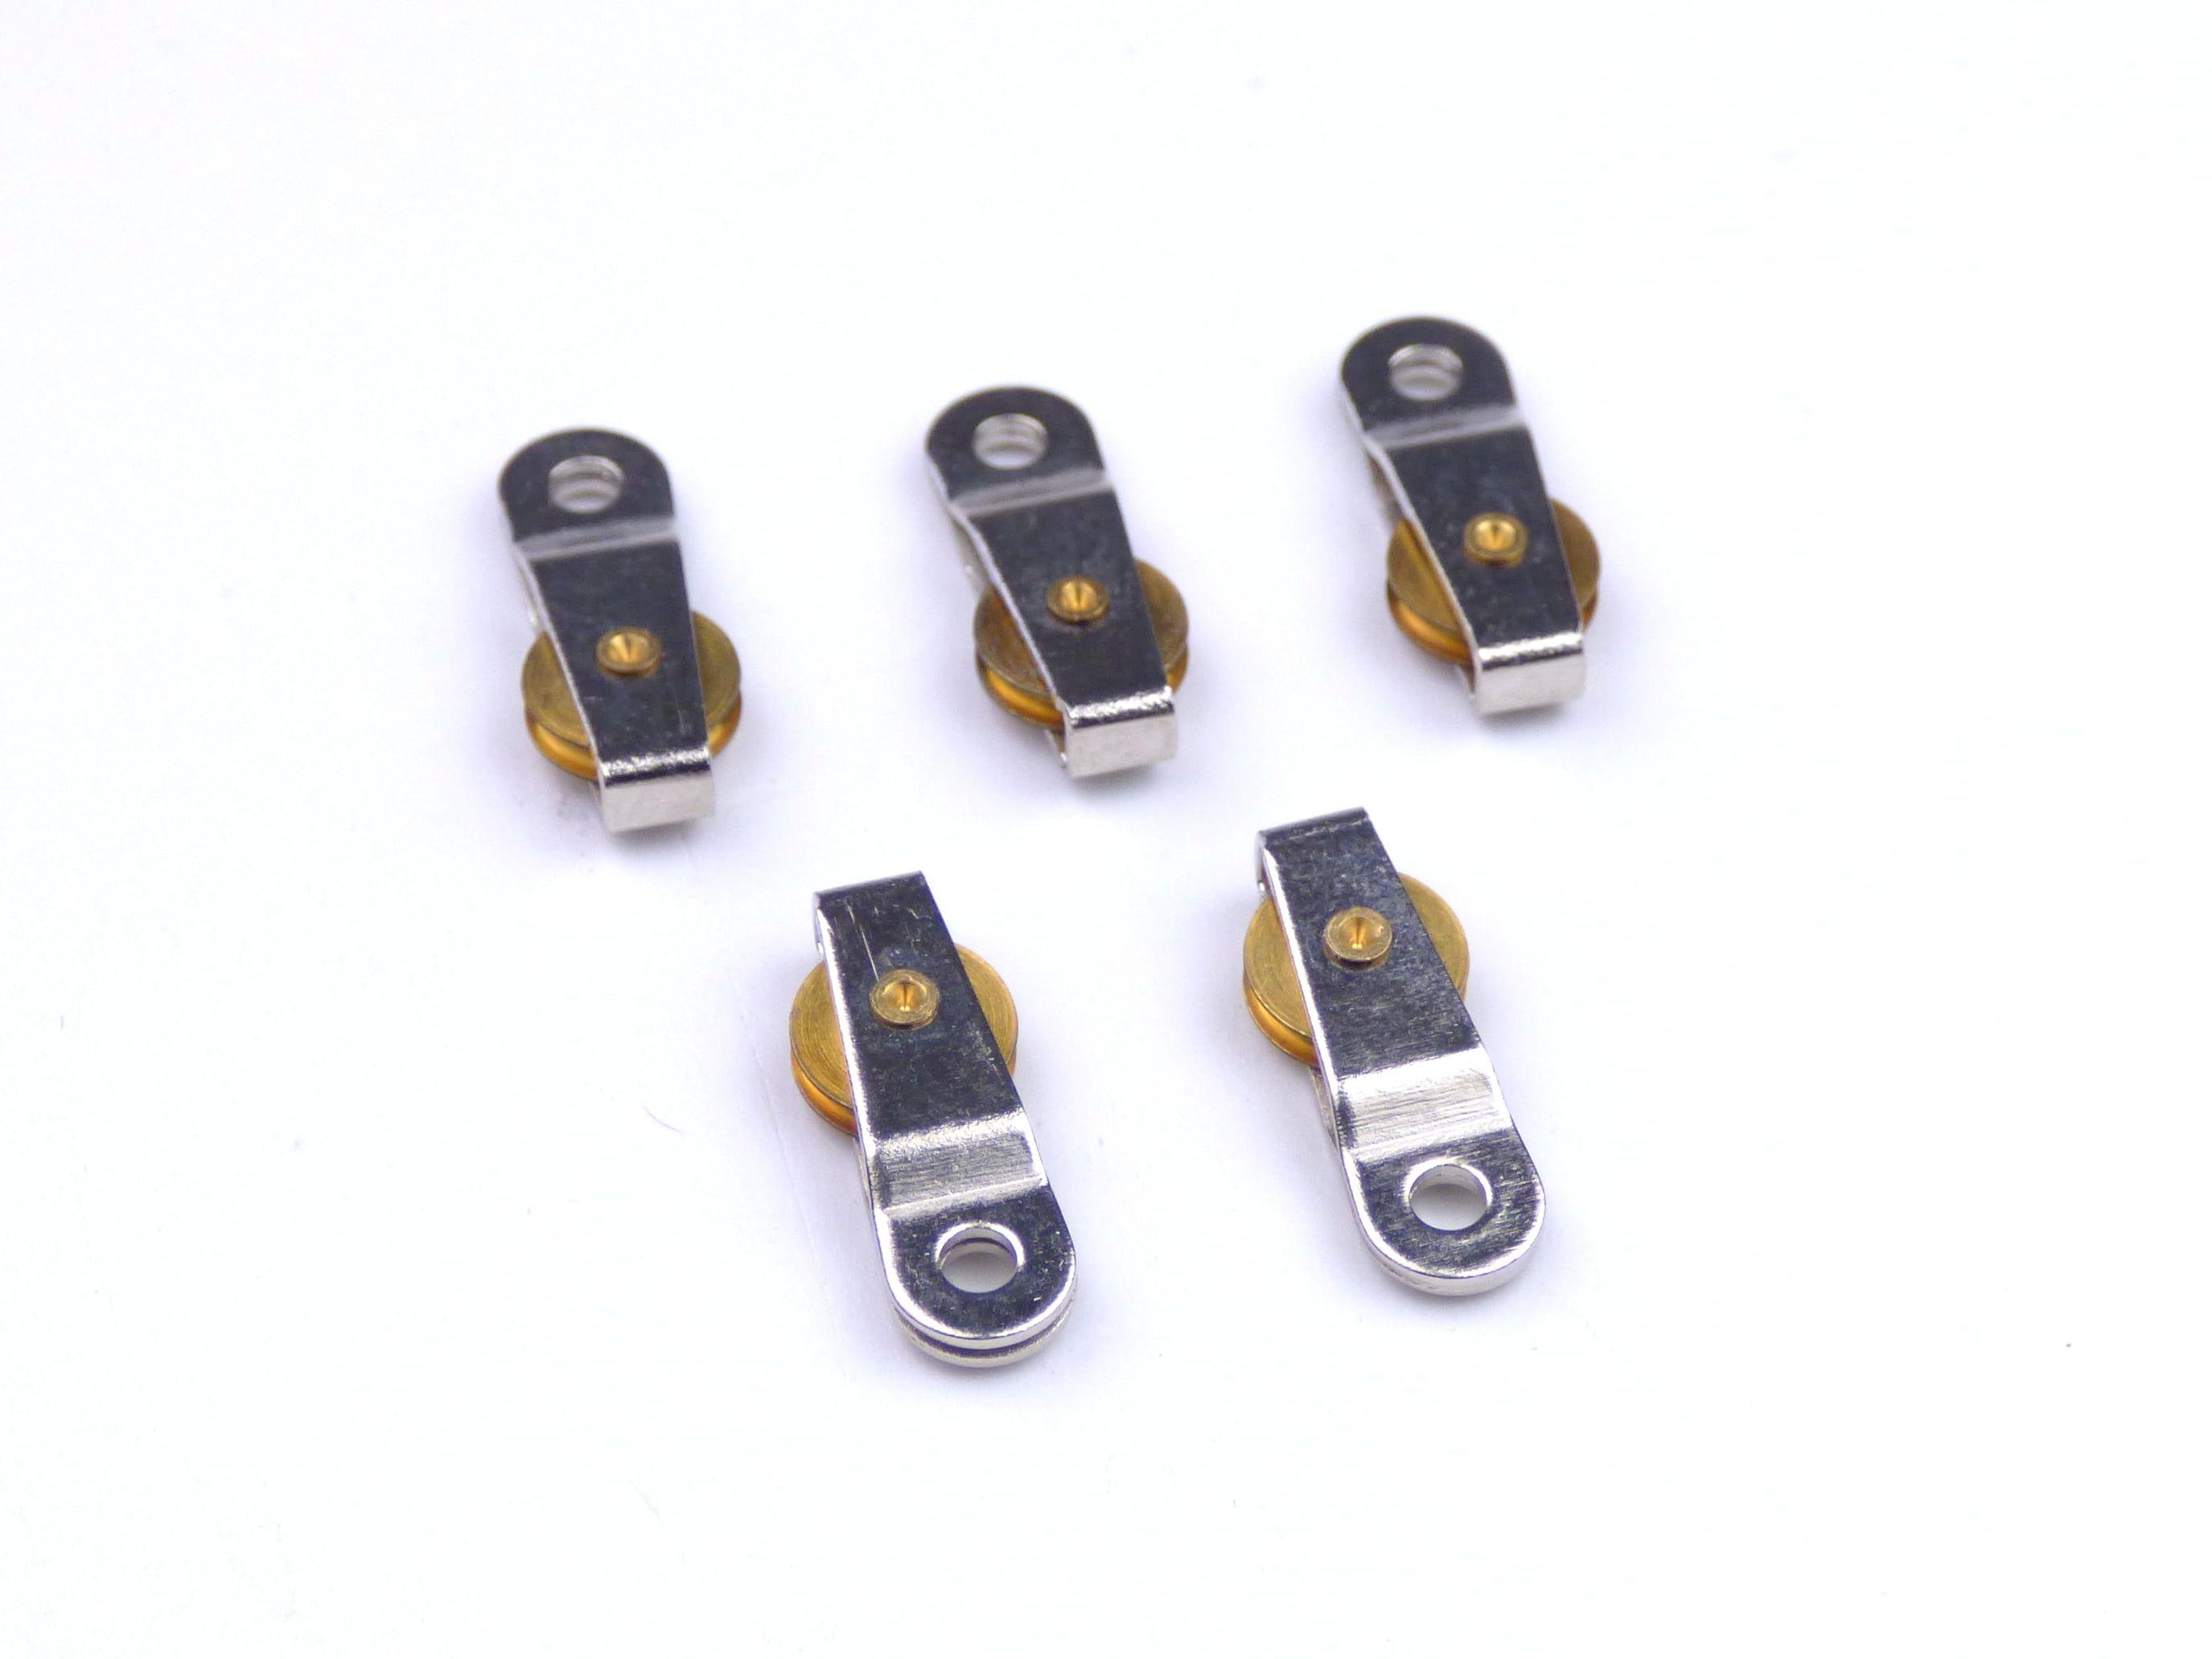 Aero Naut Single Sheave 15mm Blocks